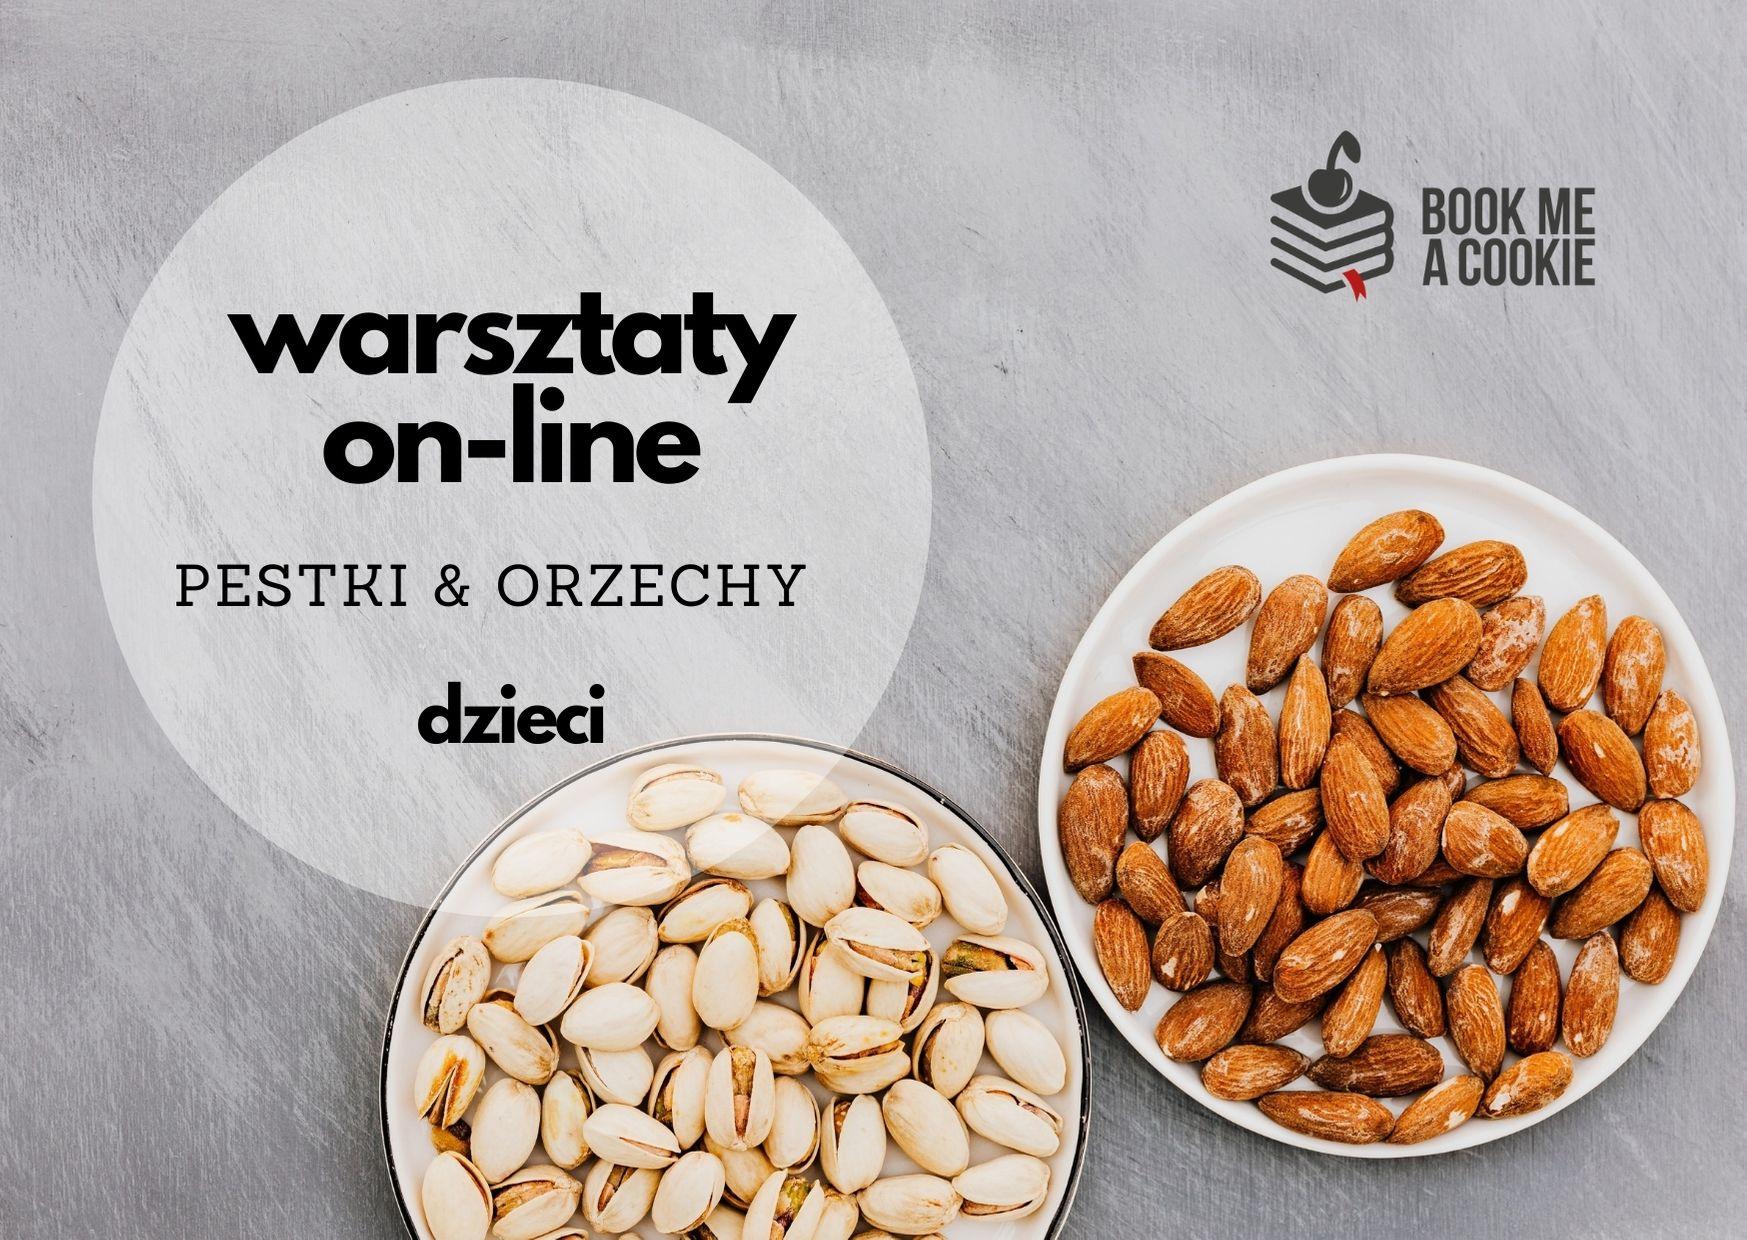 Warsztaty kulinarne ON-LINE: orzechy, pestki i nasiona